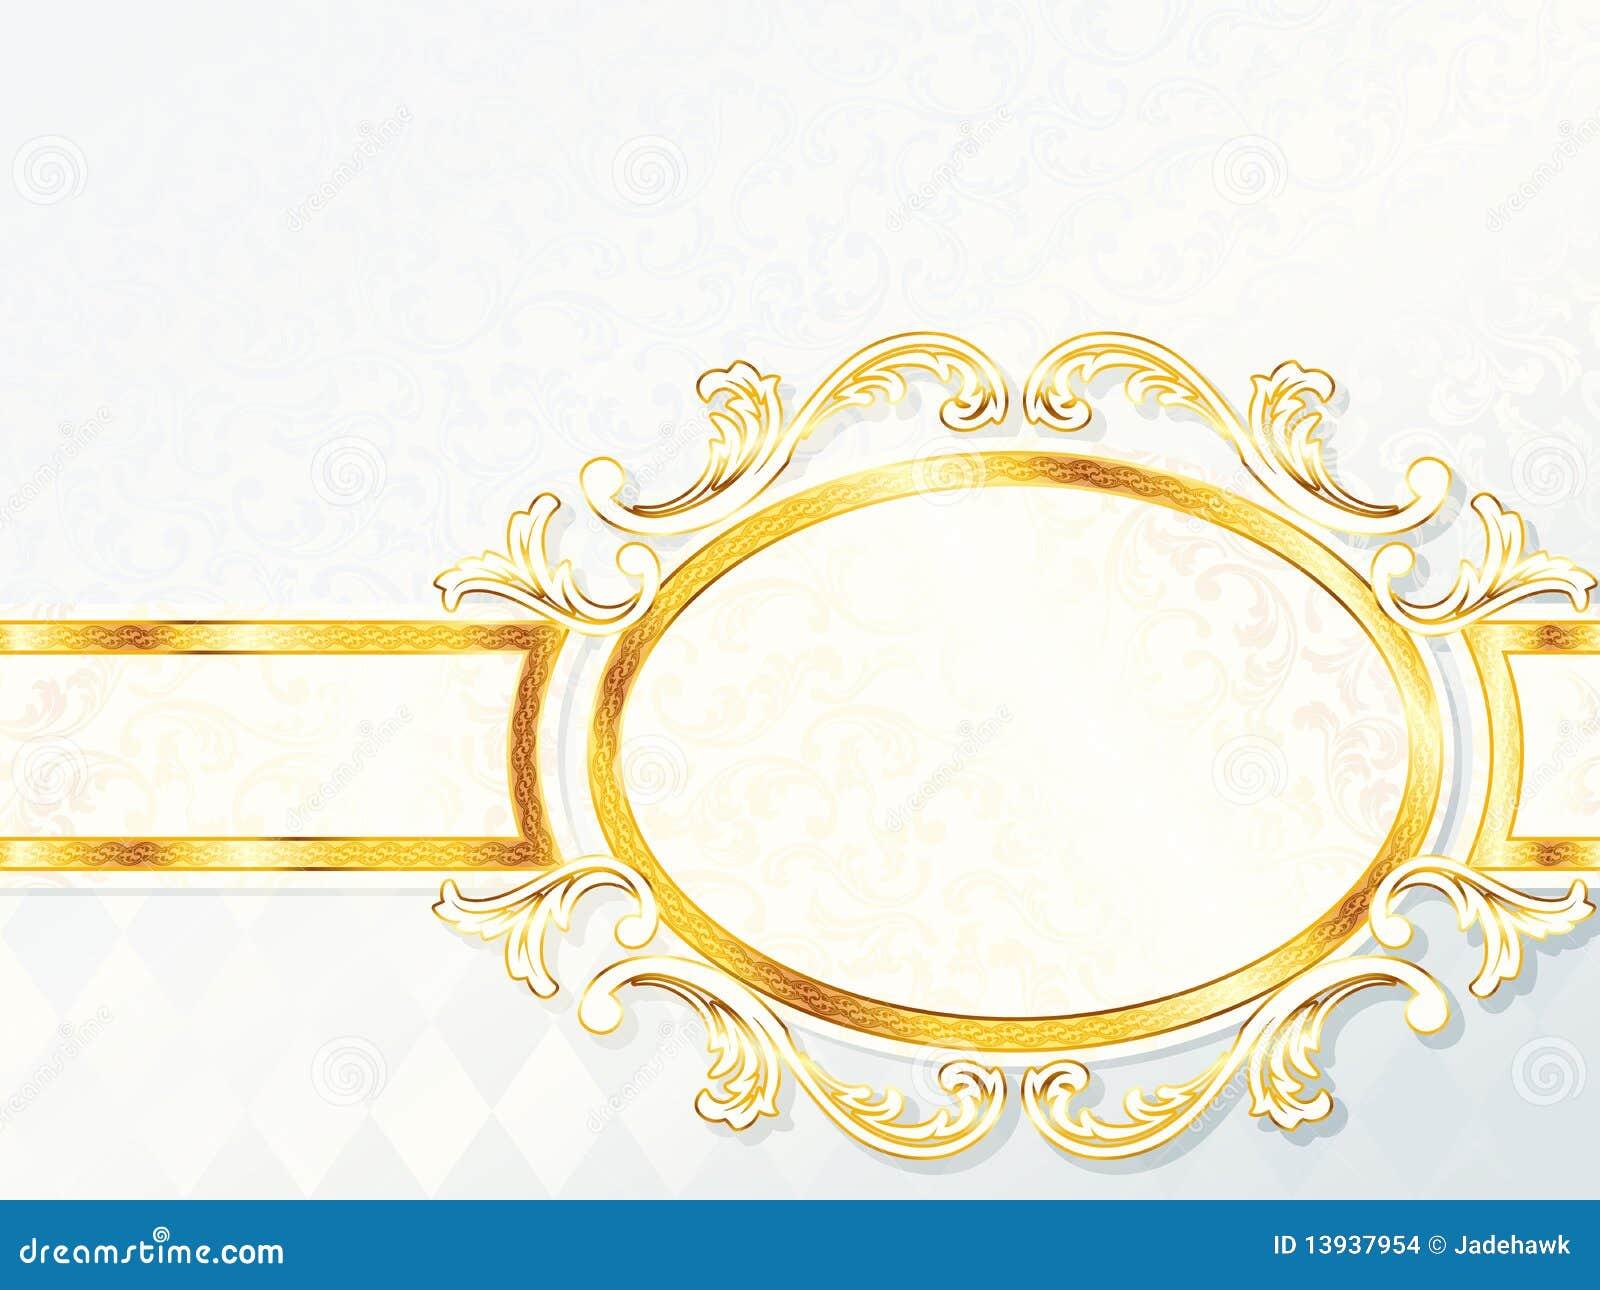 Classy Wedding Invitation as amazing invitations ideas